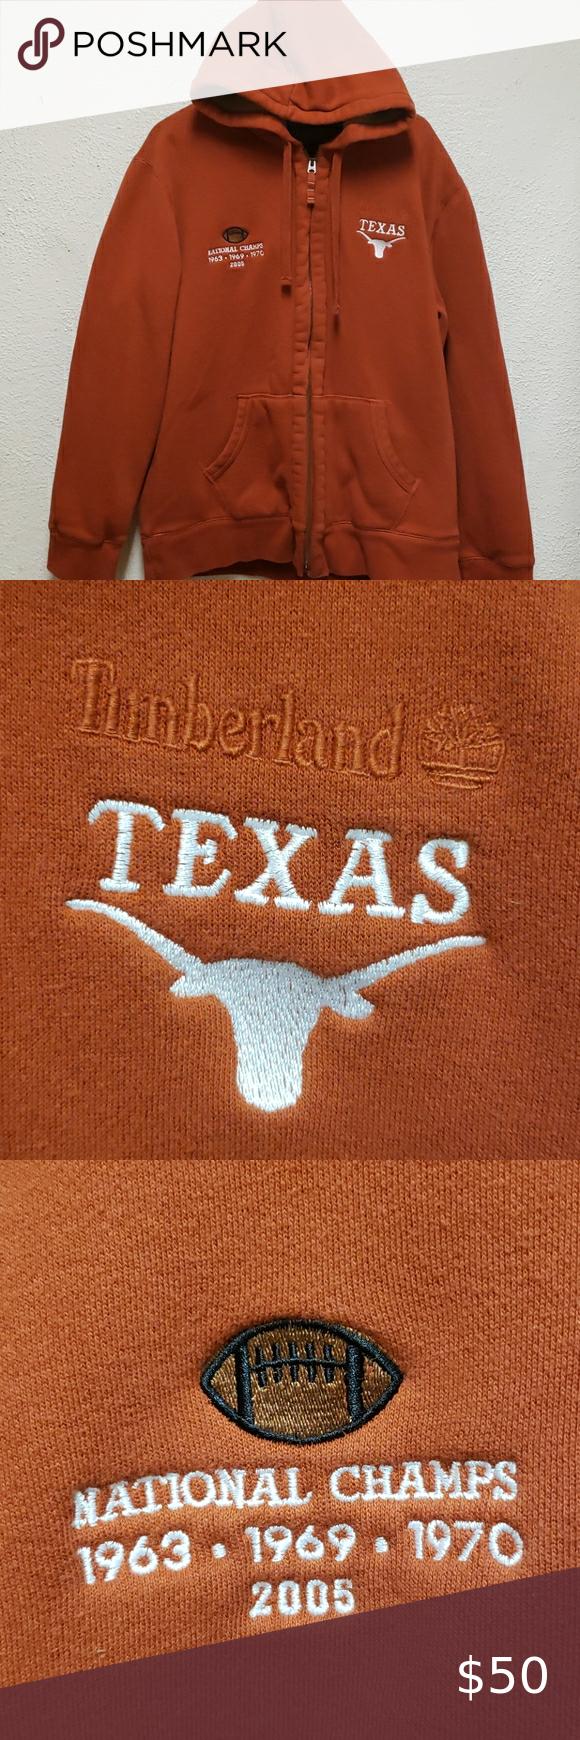 Texas Longhorns Championship Hooded Sweatshirt In 2020 Hooded Sweatshirts Timberland Shirts Sweatshirts [ 1740 x 580 Pixel ]